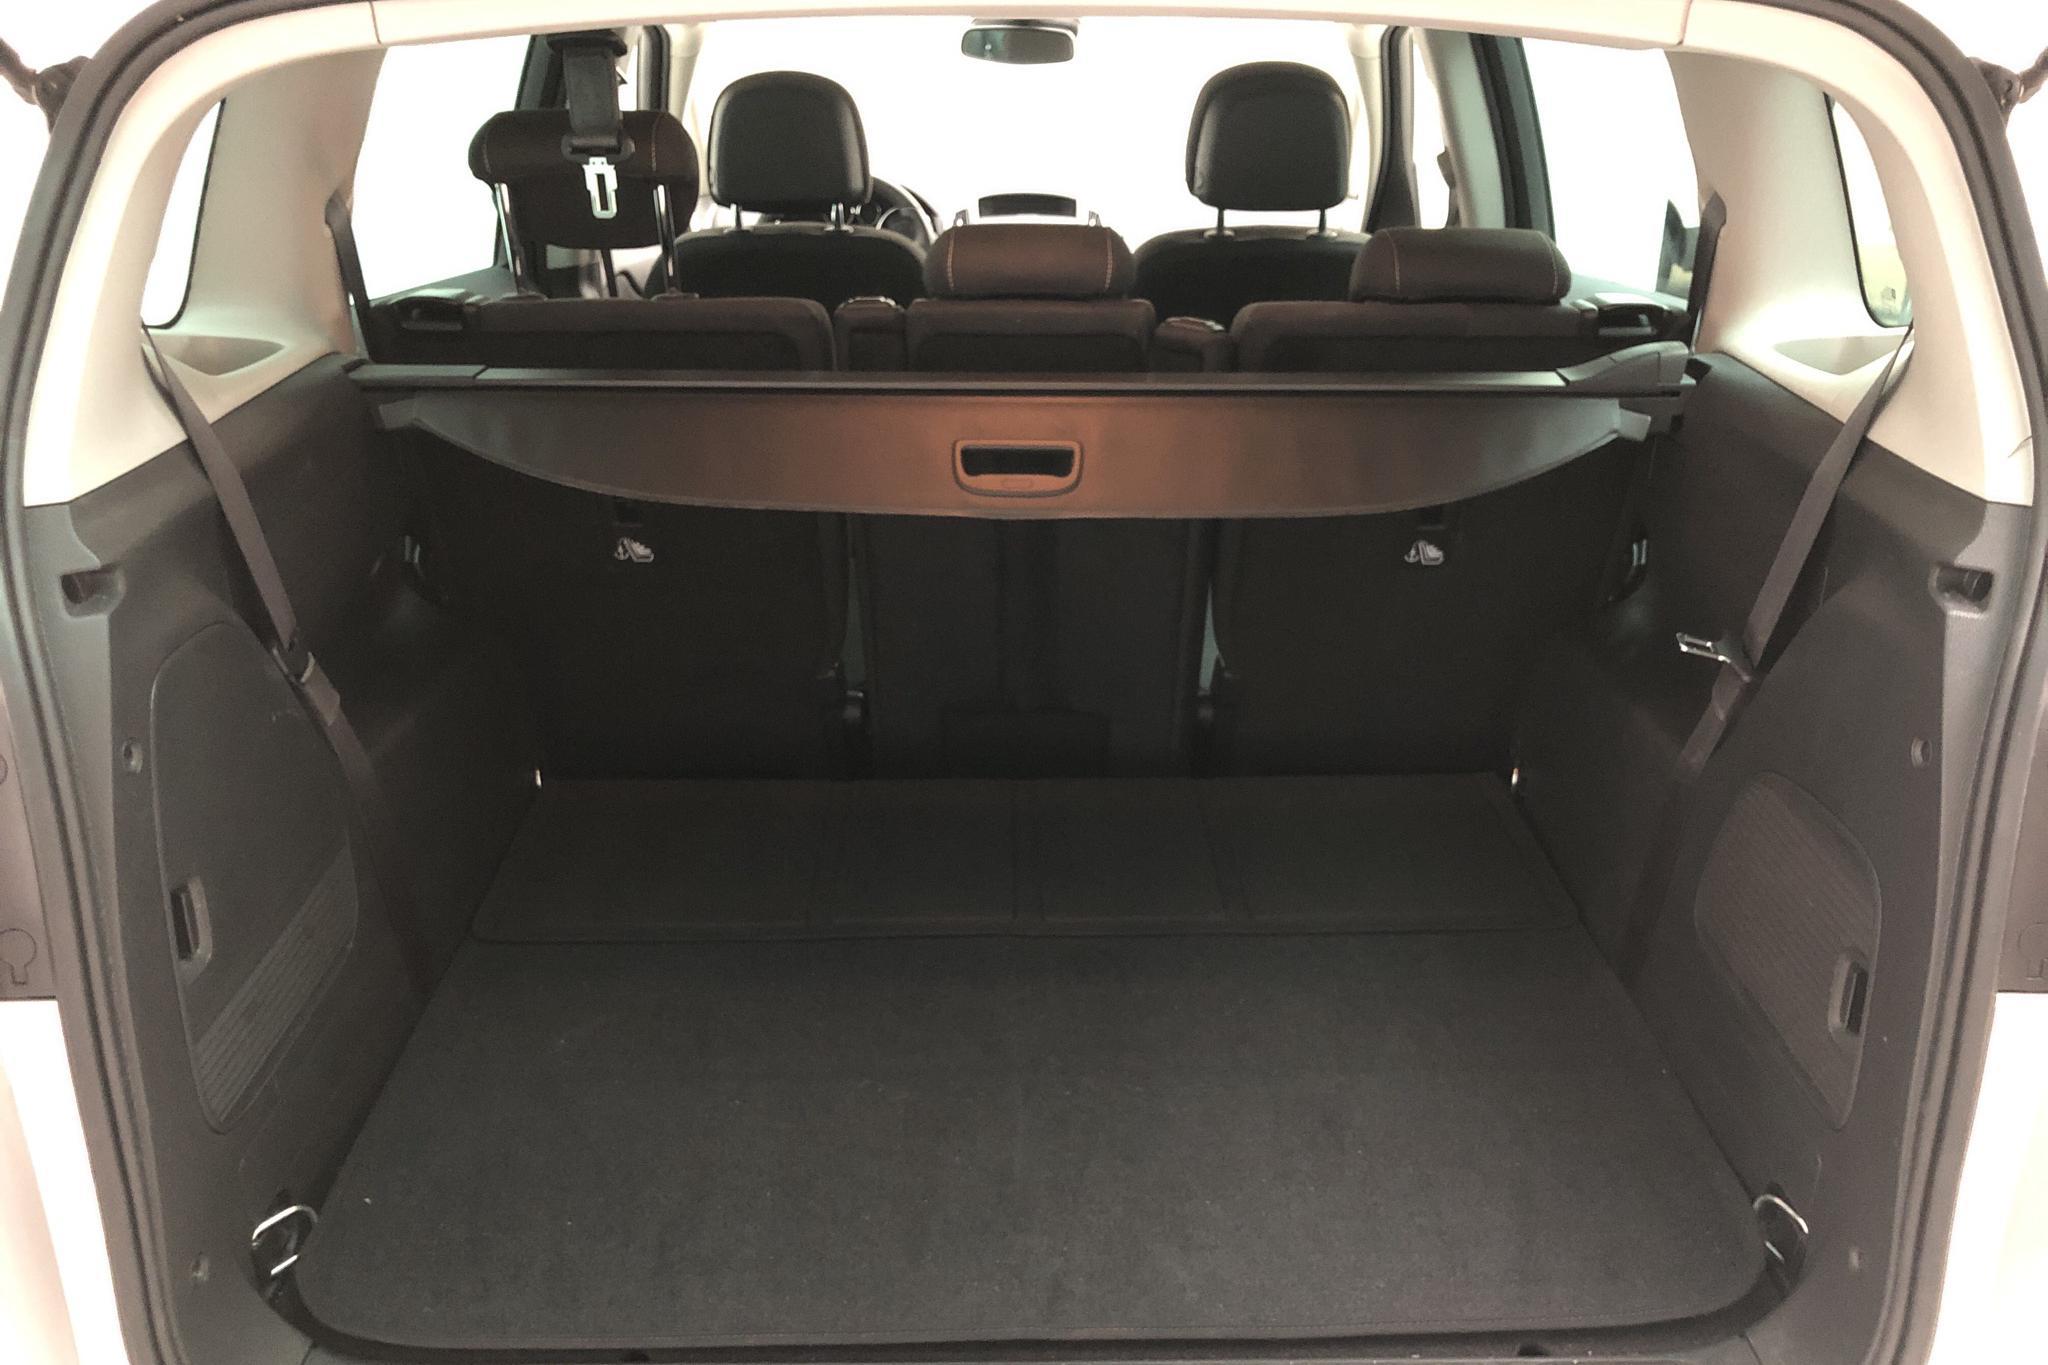 Opel Zafira Tourer 1.4T (140hk) - 23 350 km - Manual - gray - 2012